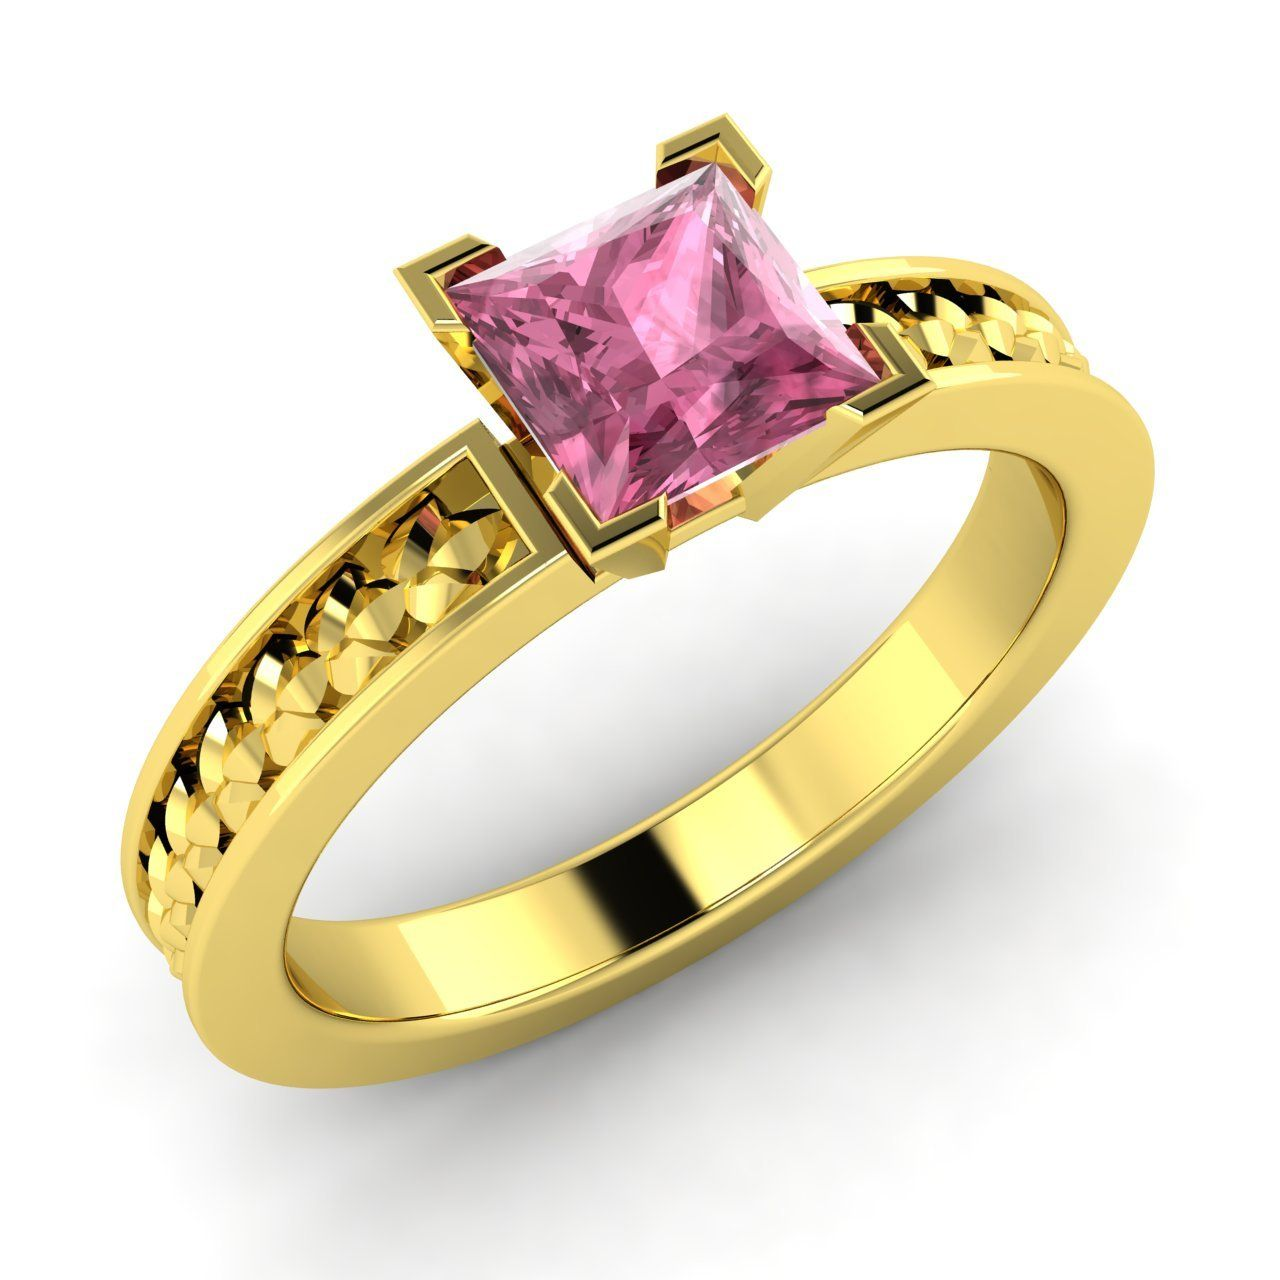 ct princess cut natural pink tourmaline solitaire ring in k